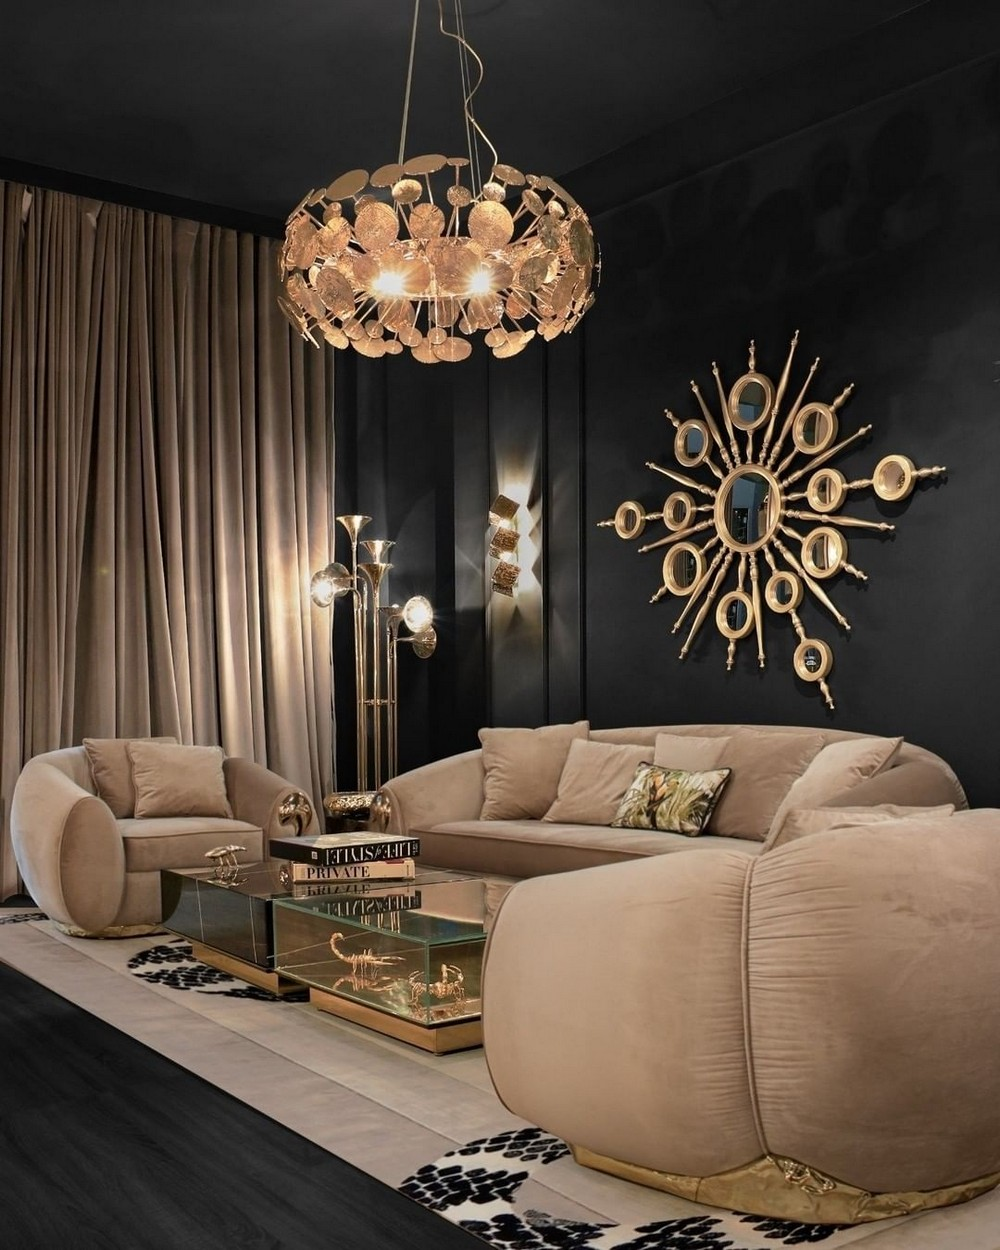 living room ideas 18 Living Room Ideas And Essentials – PART III 18 1